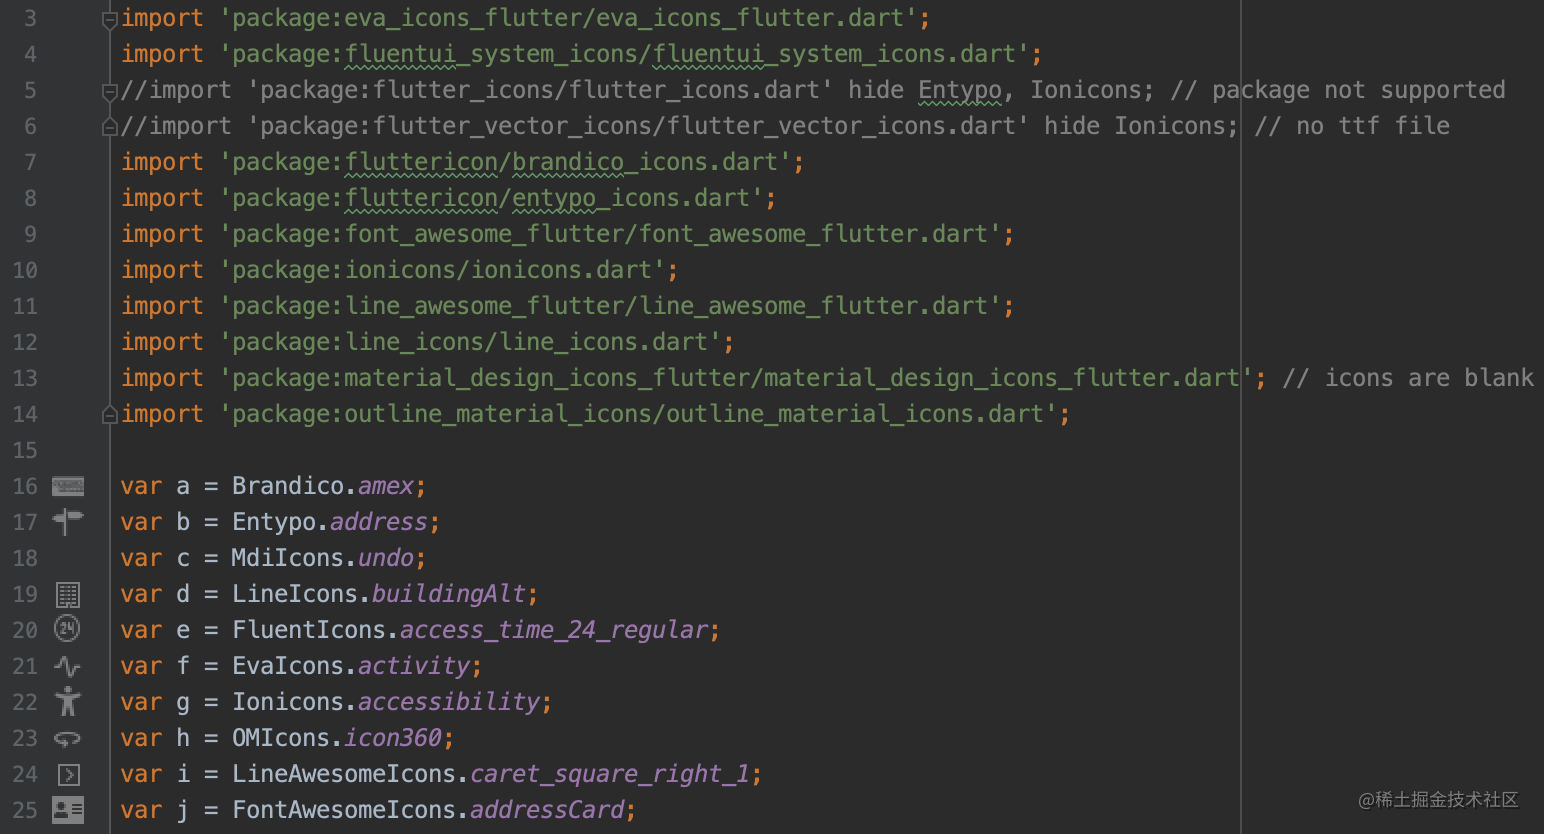 IntelliJ / Android Studio 中的图标预览